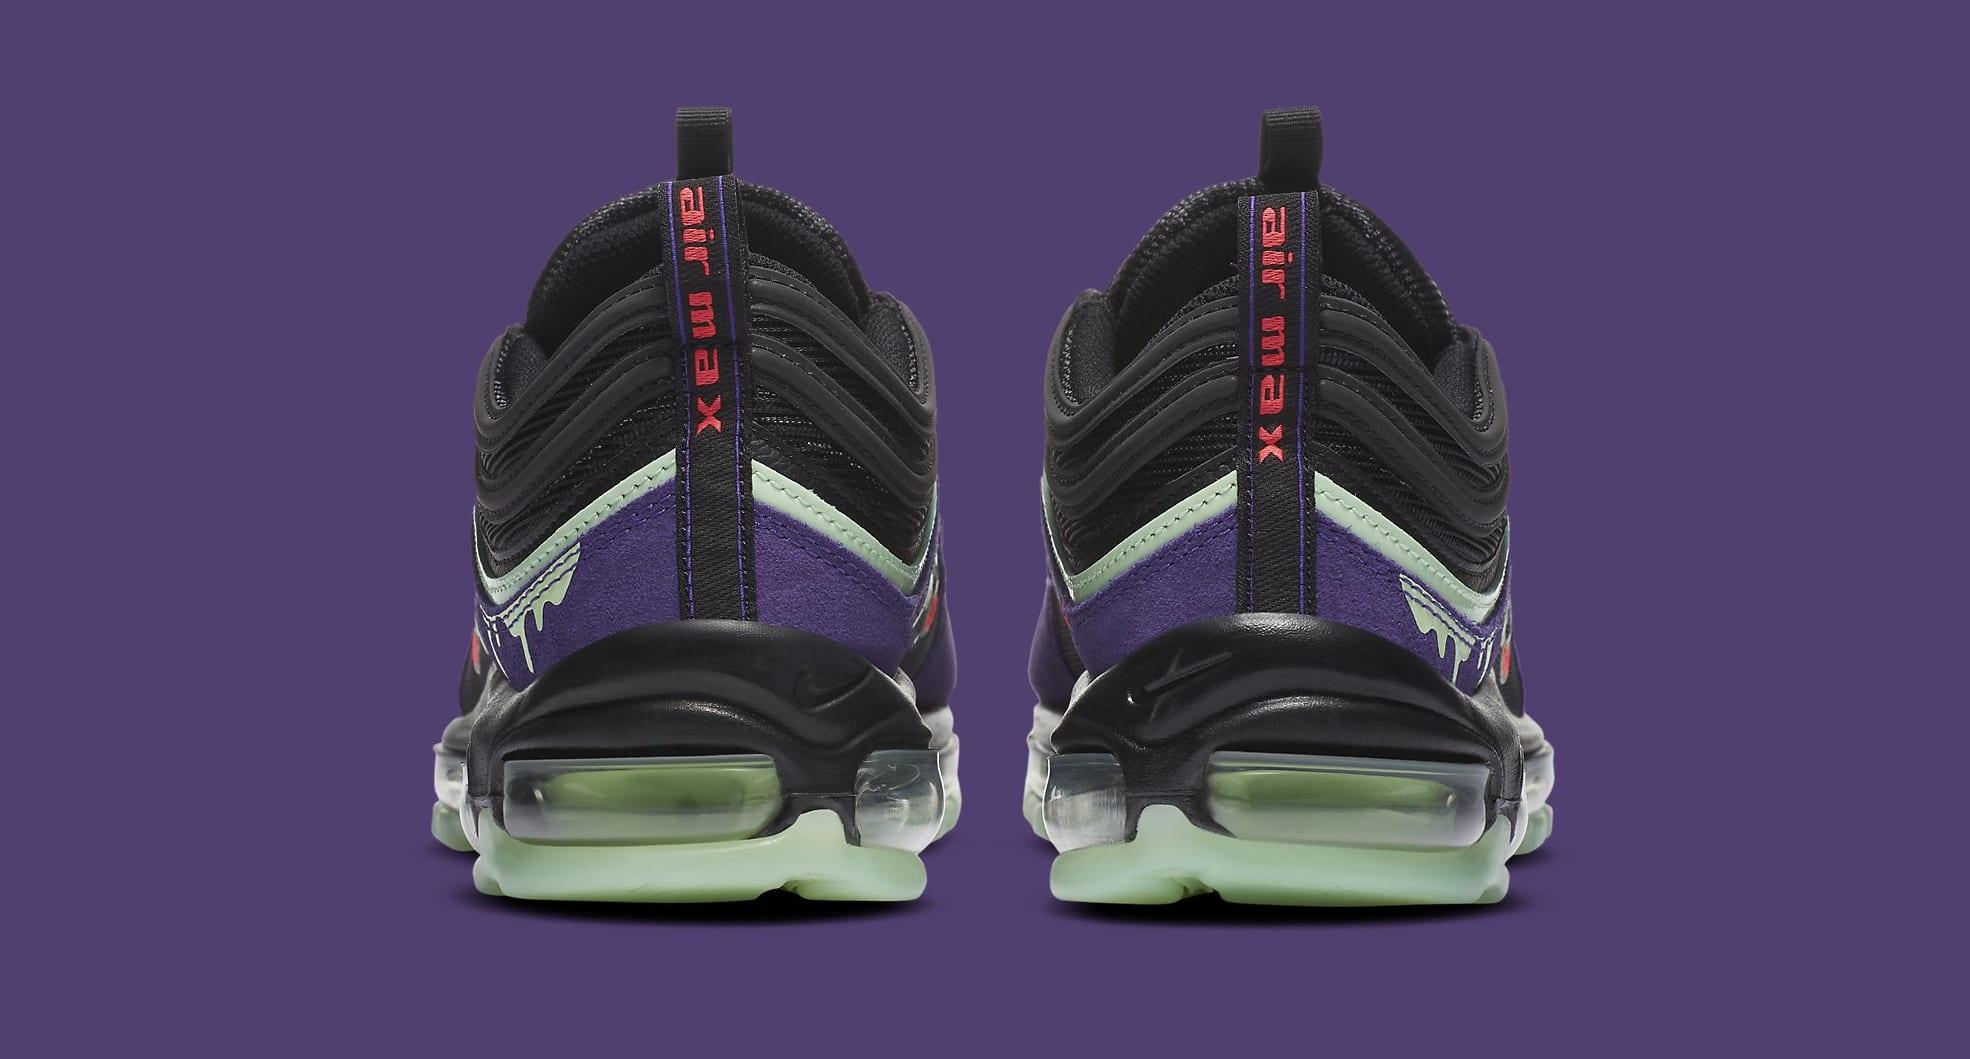 Nike Air Max 97 'Halloween' DC1500-001 Heel